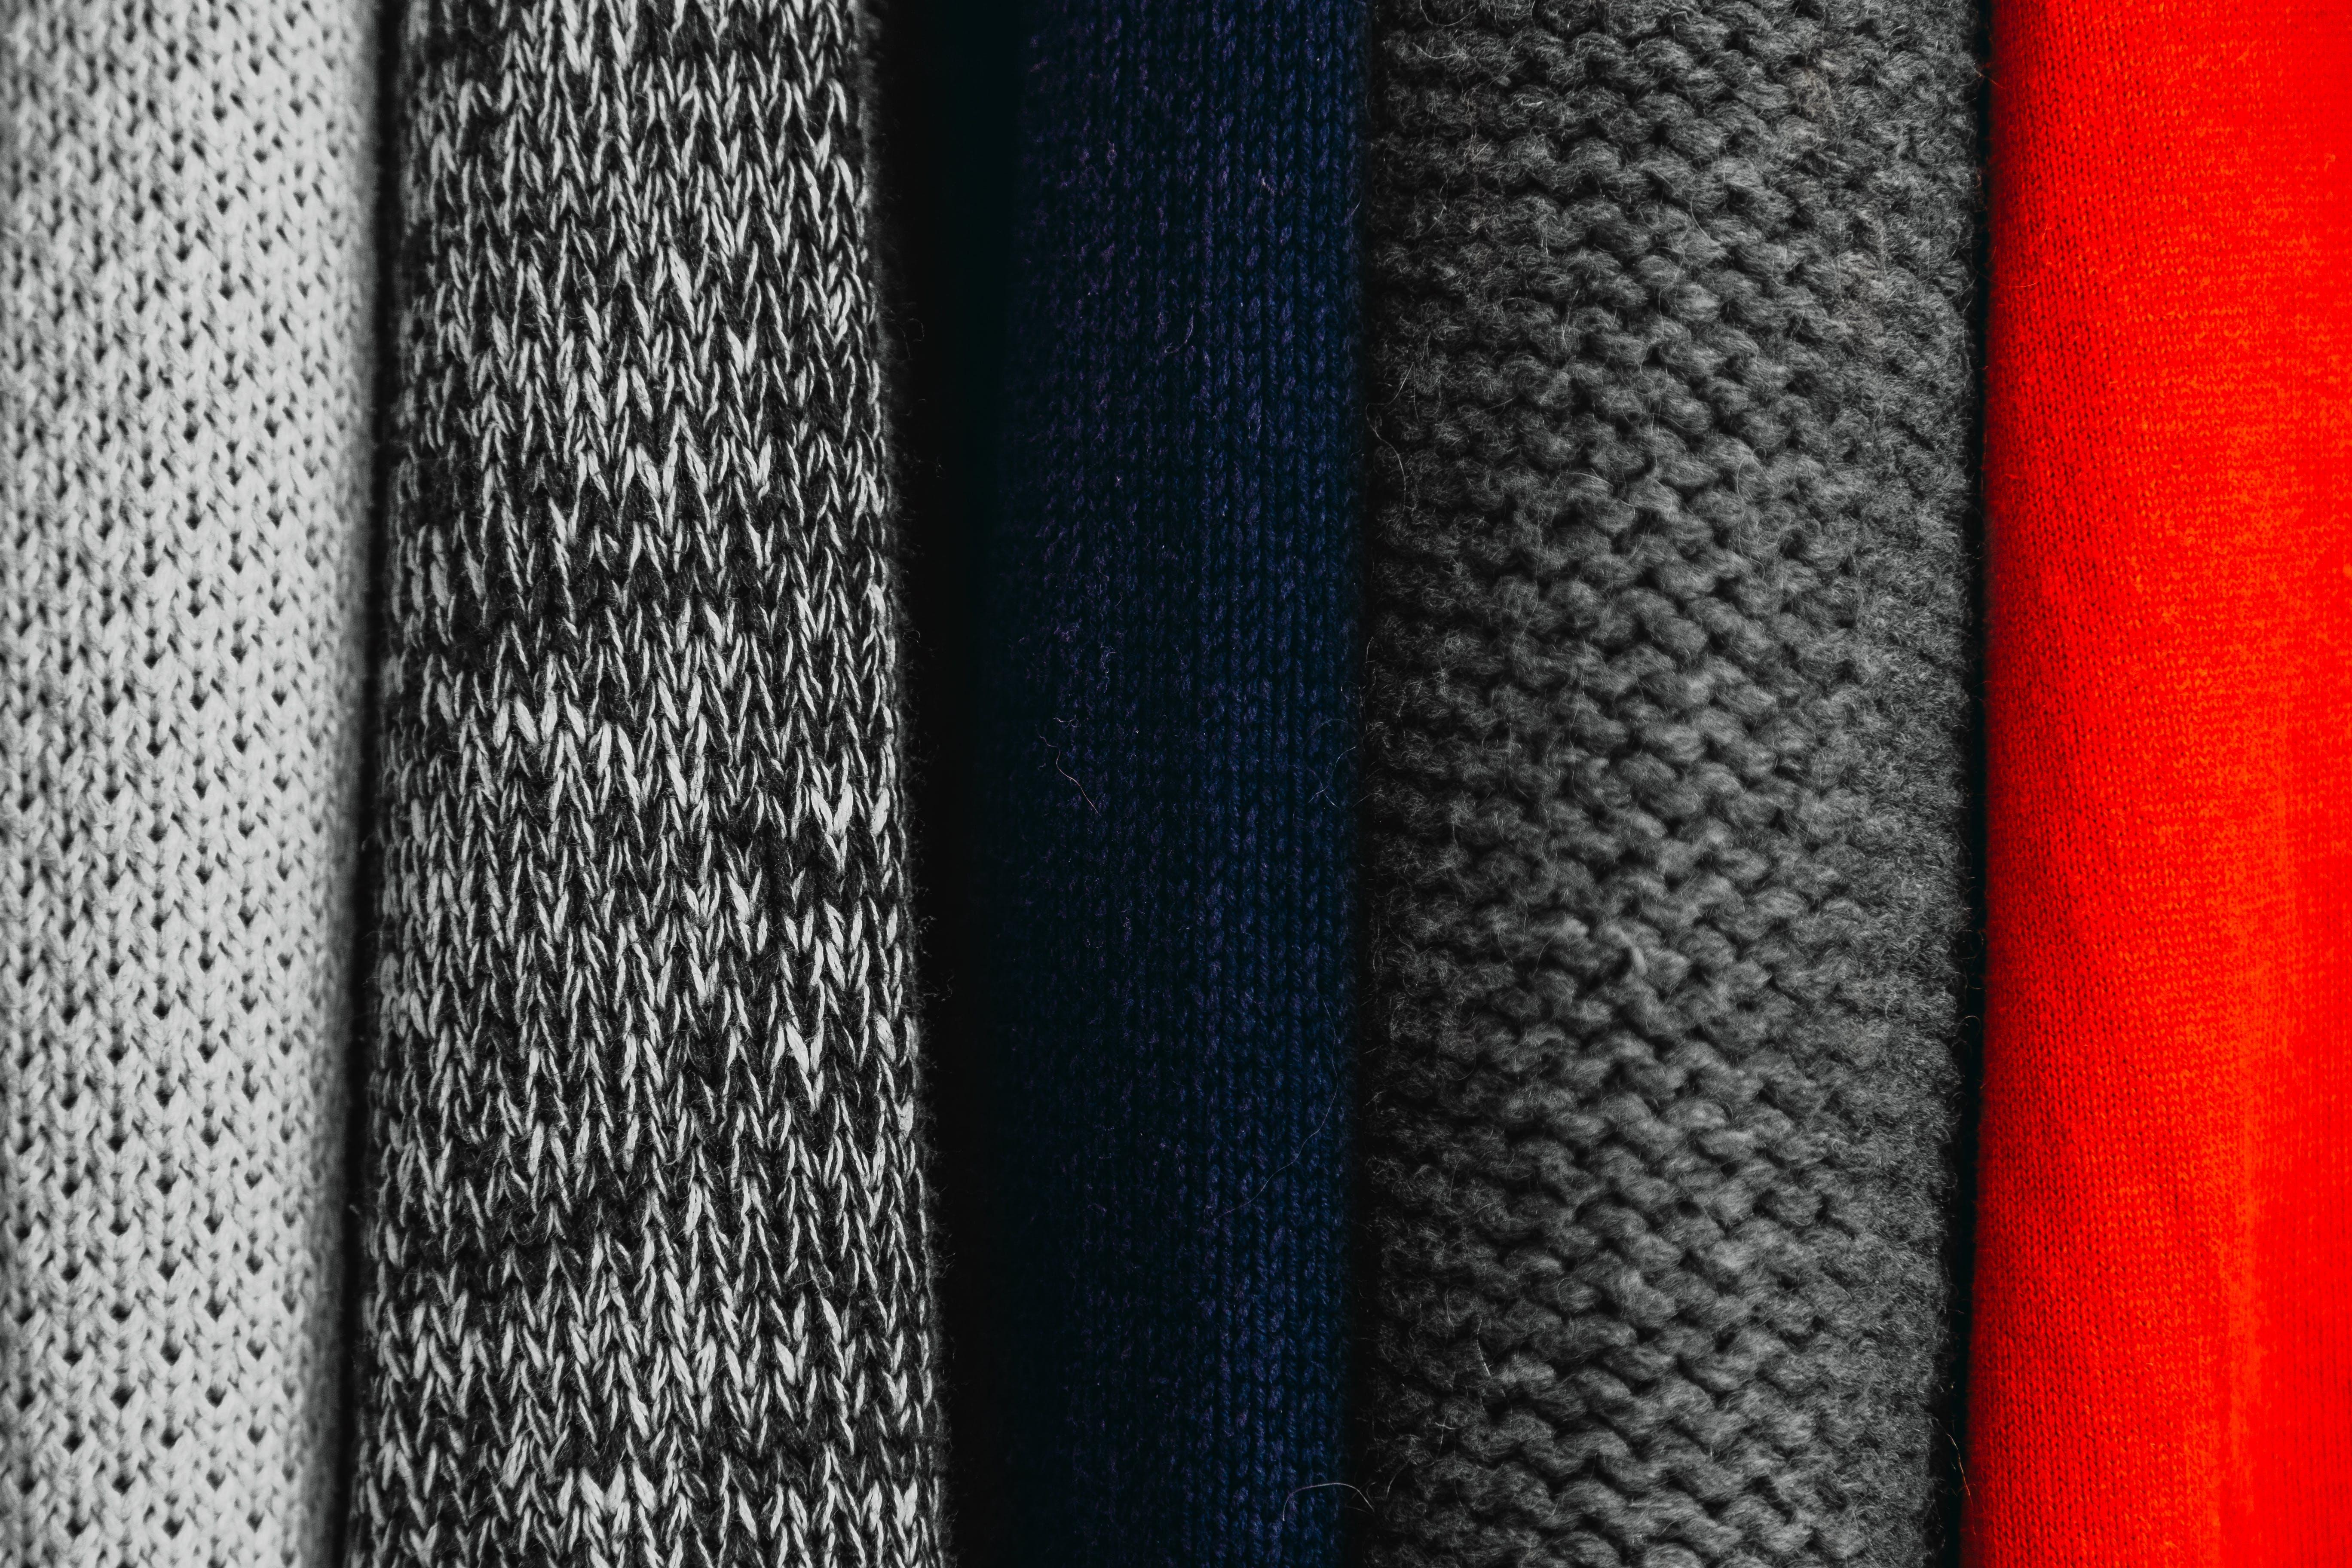 Assorted-color Knit Textiles